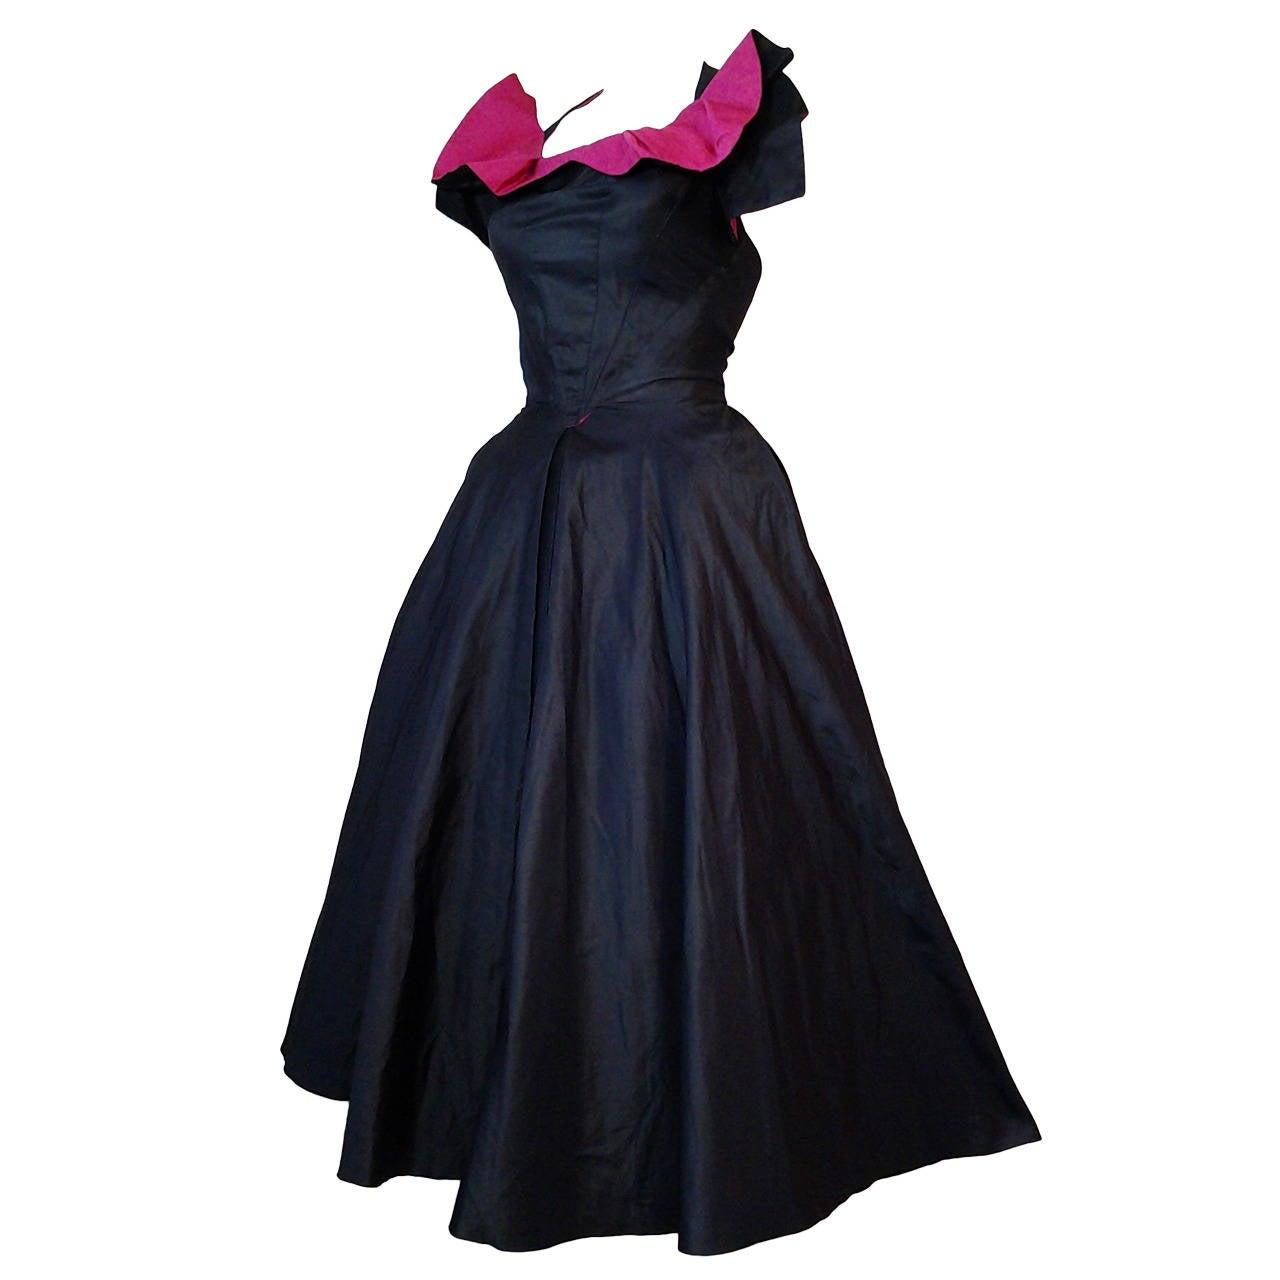 1950s Navy And Fuchsia Taffeta And Faille Dress W